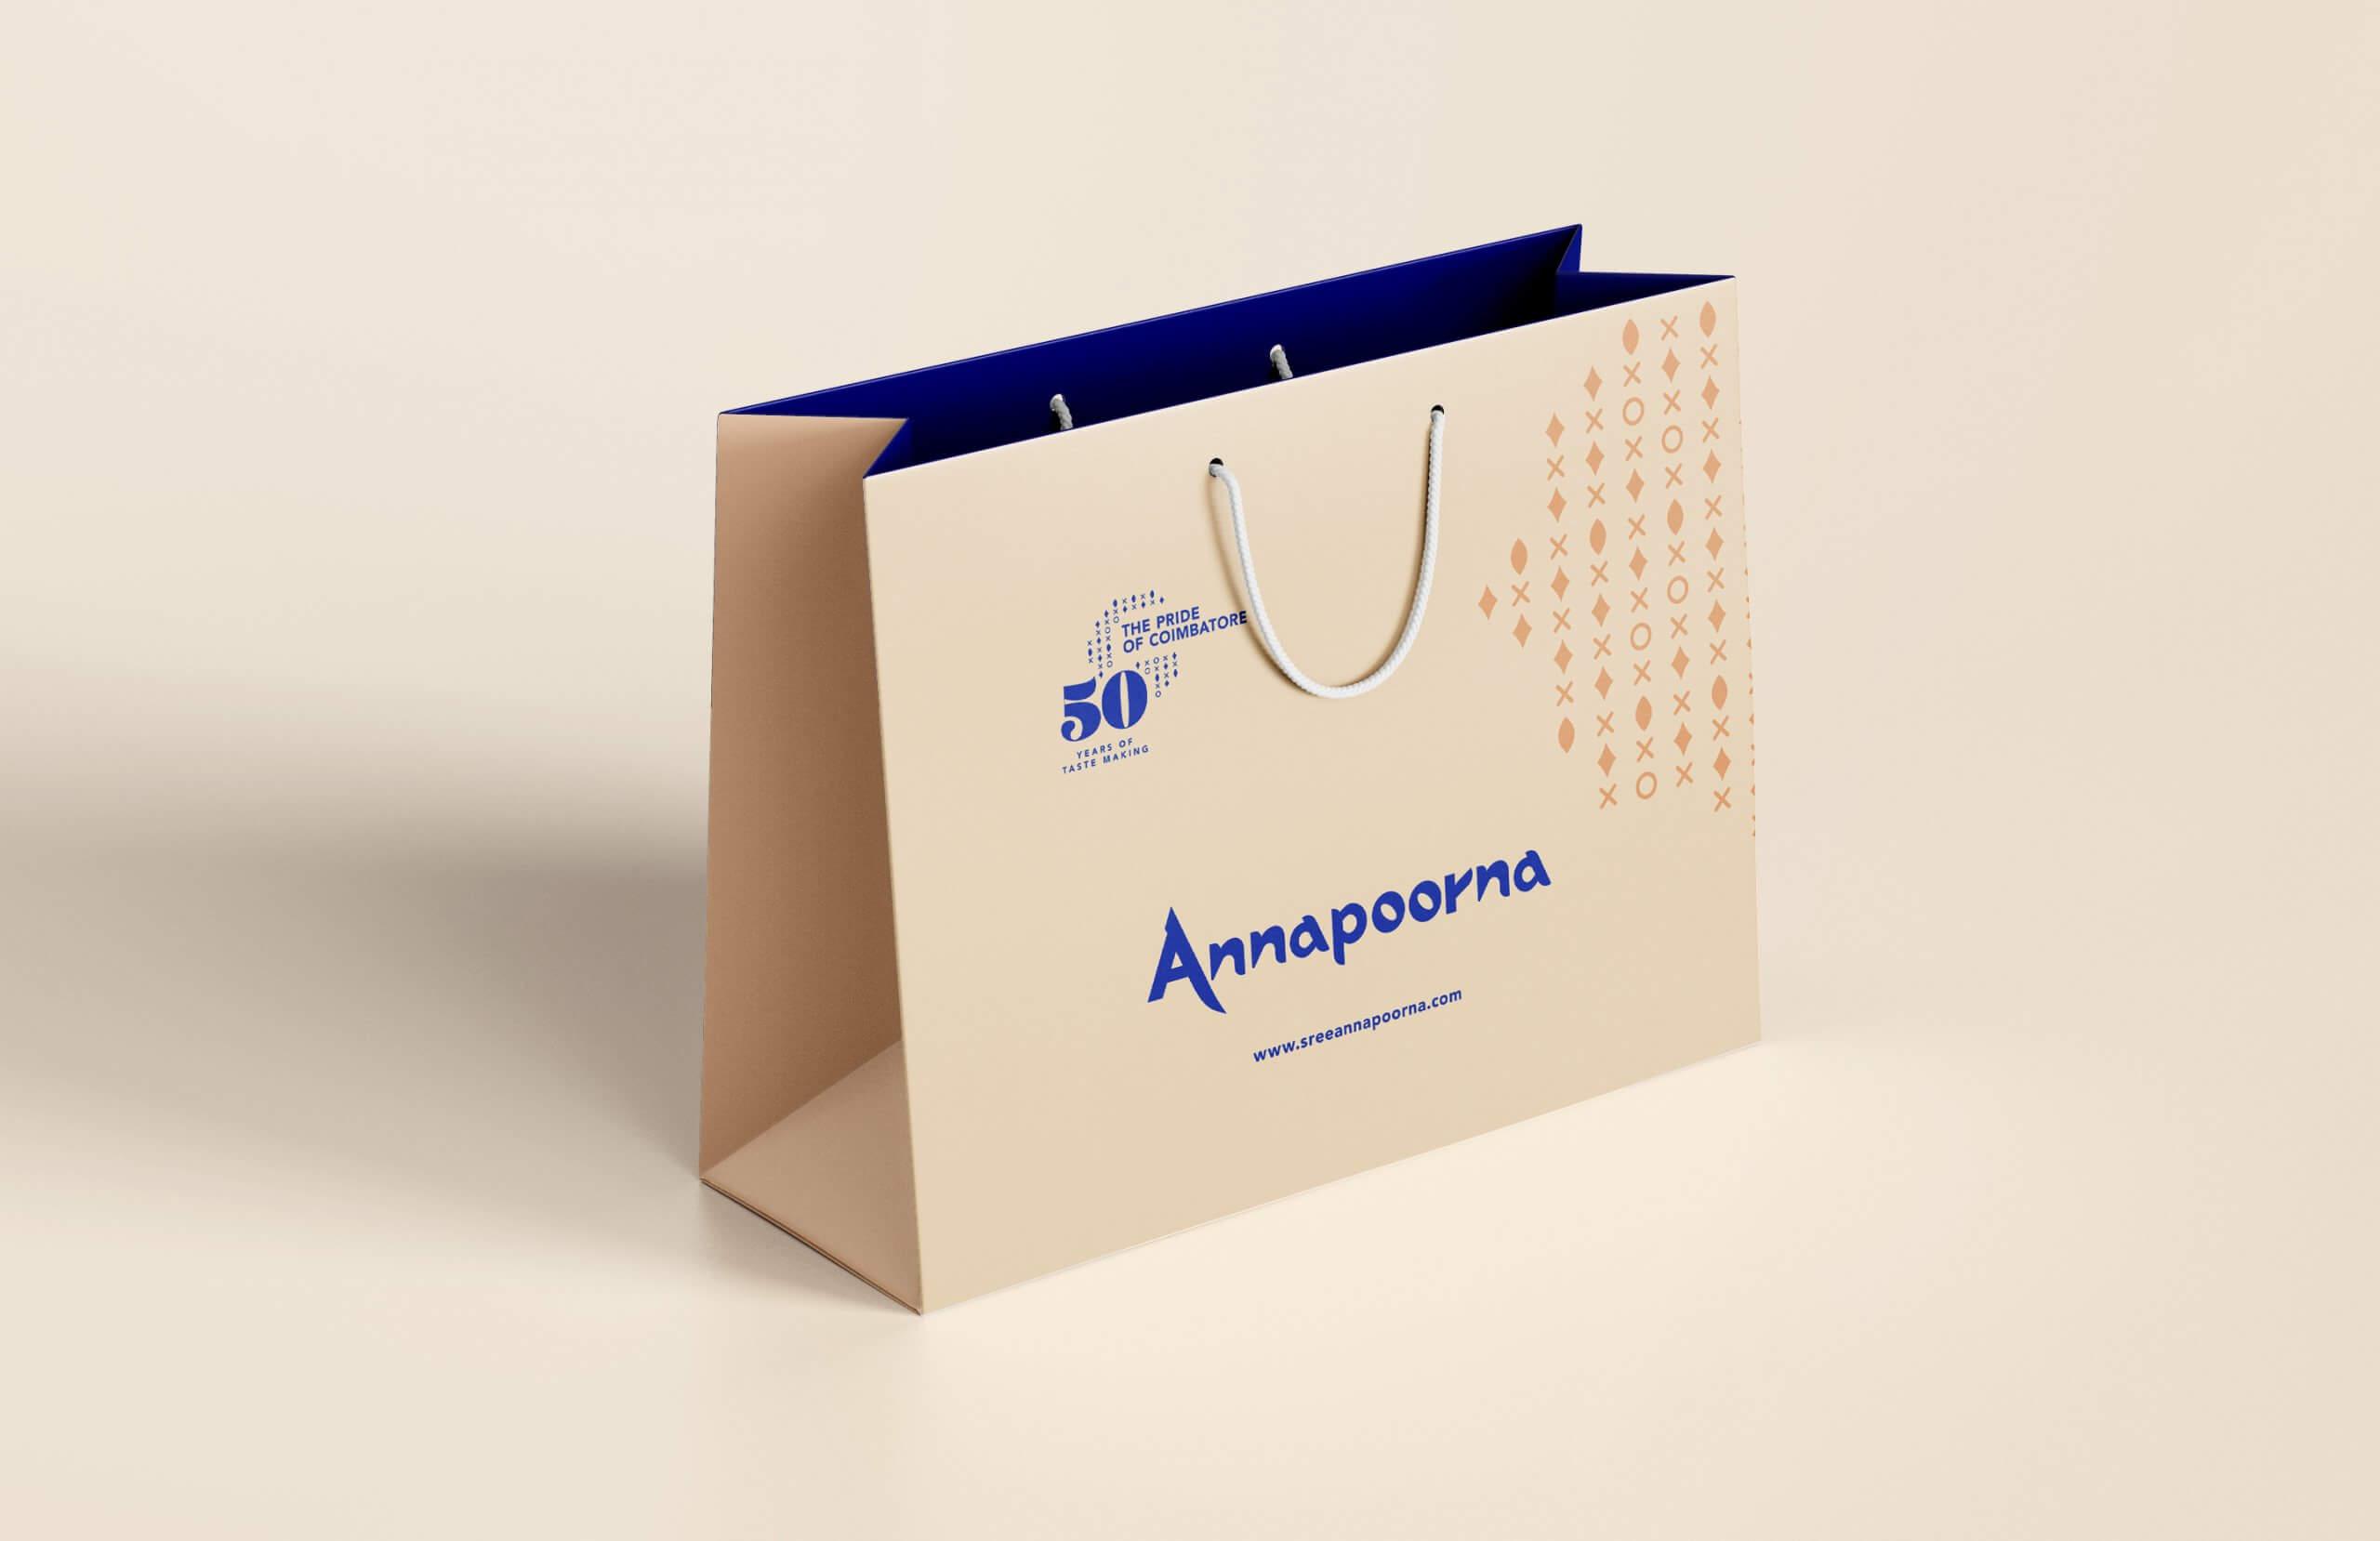 Annapoorna_Shopping-Bag_v01_2020